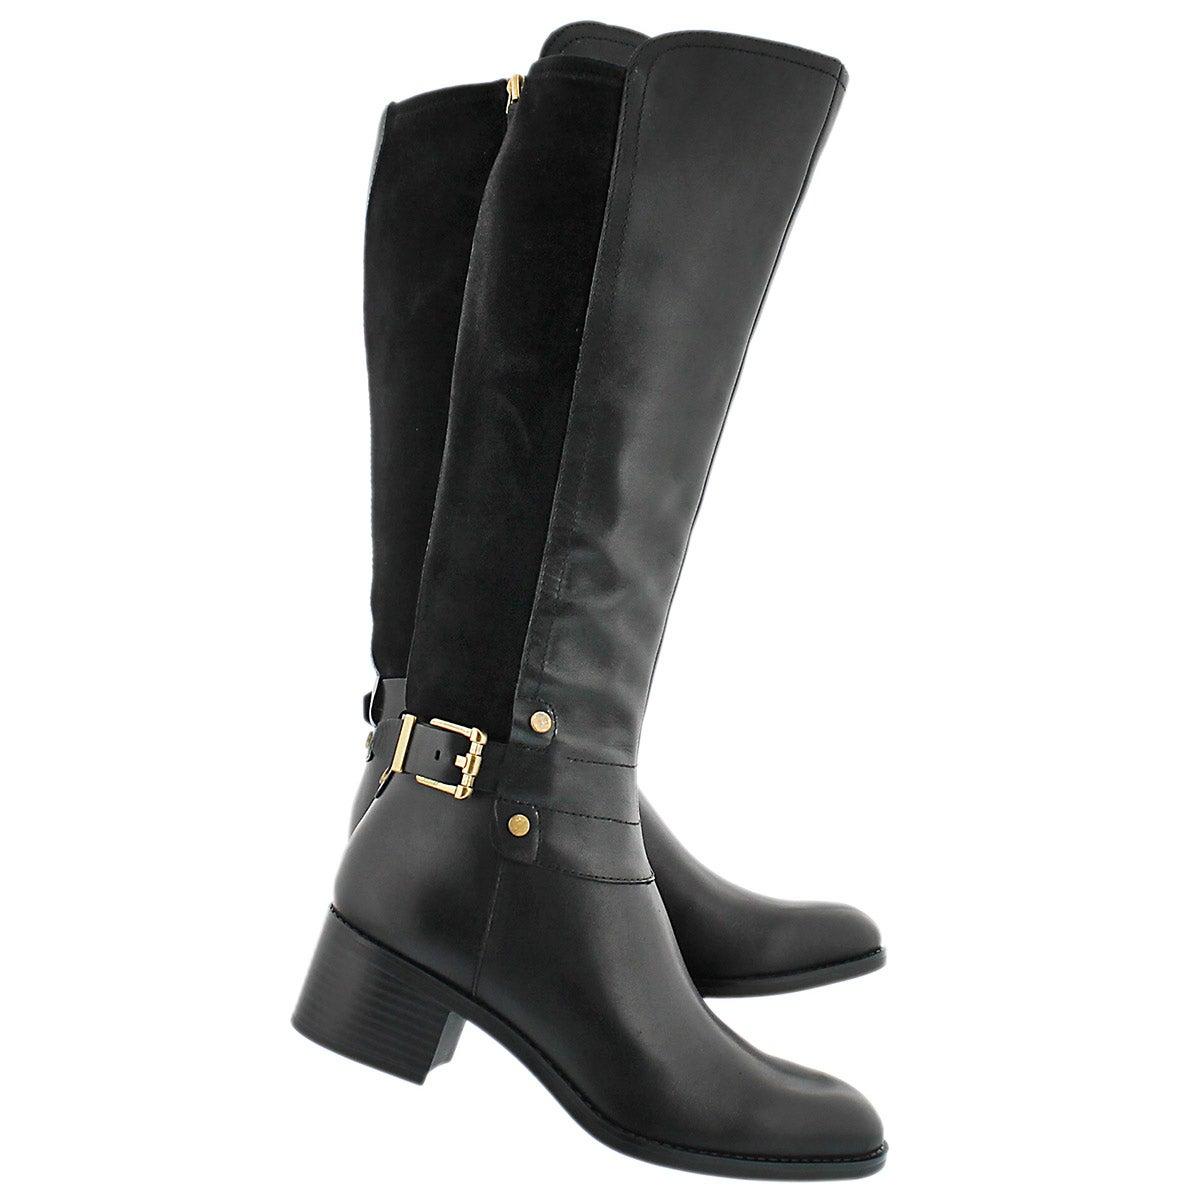 Lds Liora black riding boot